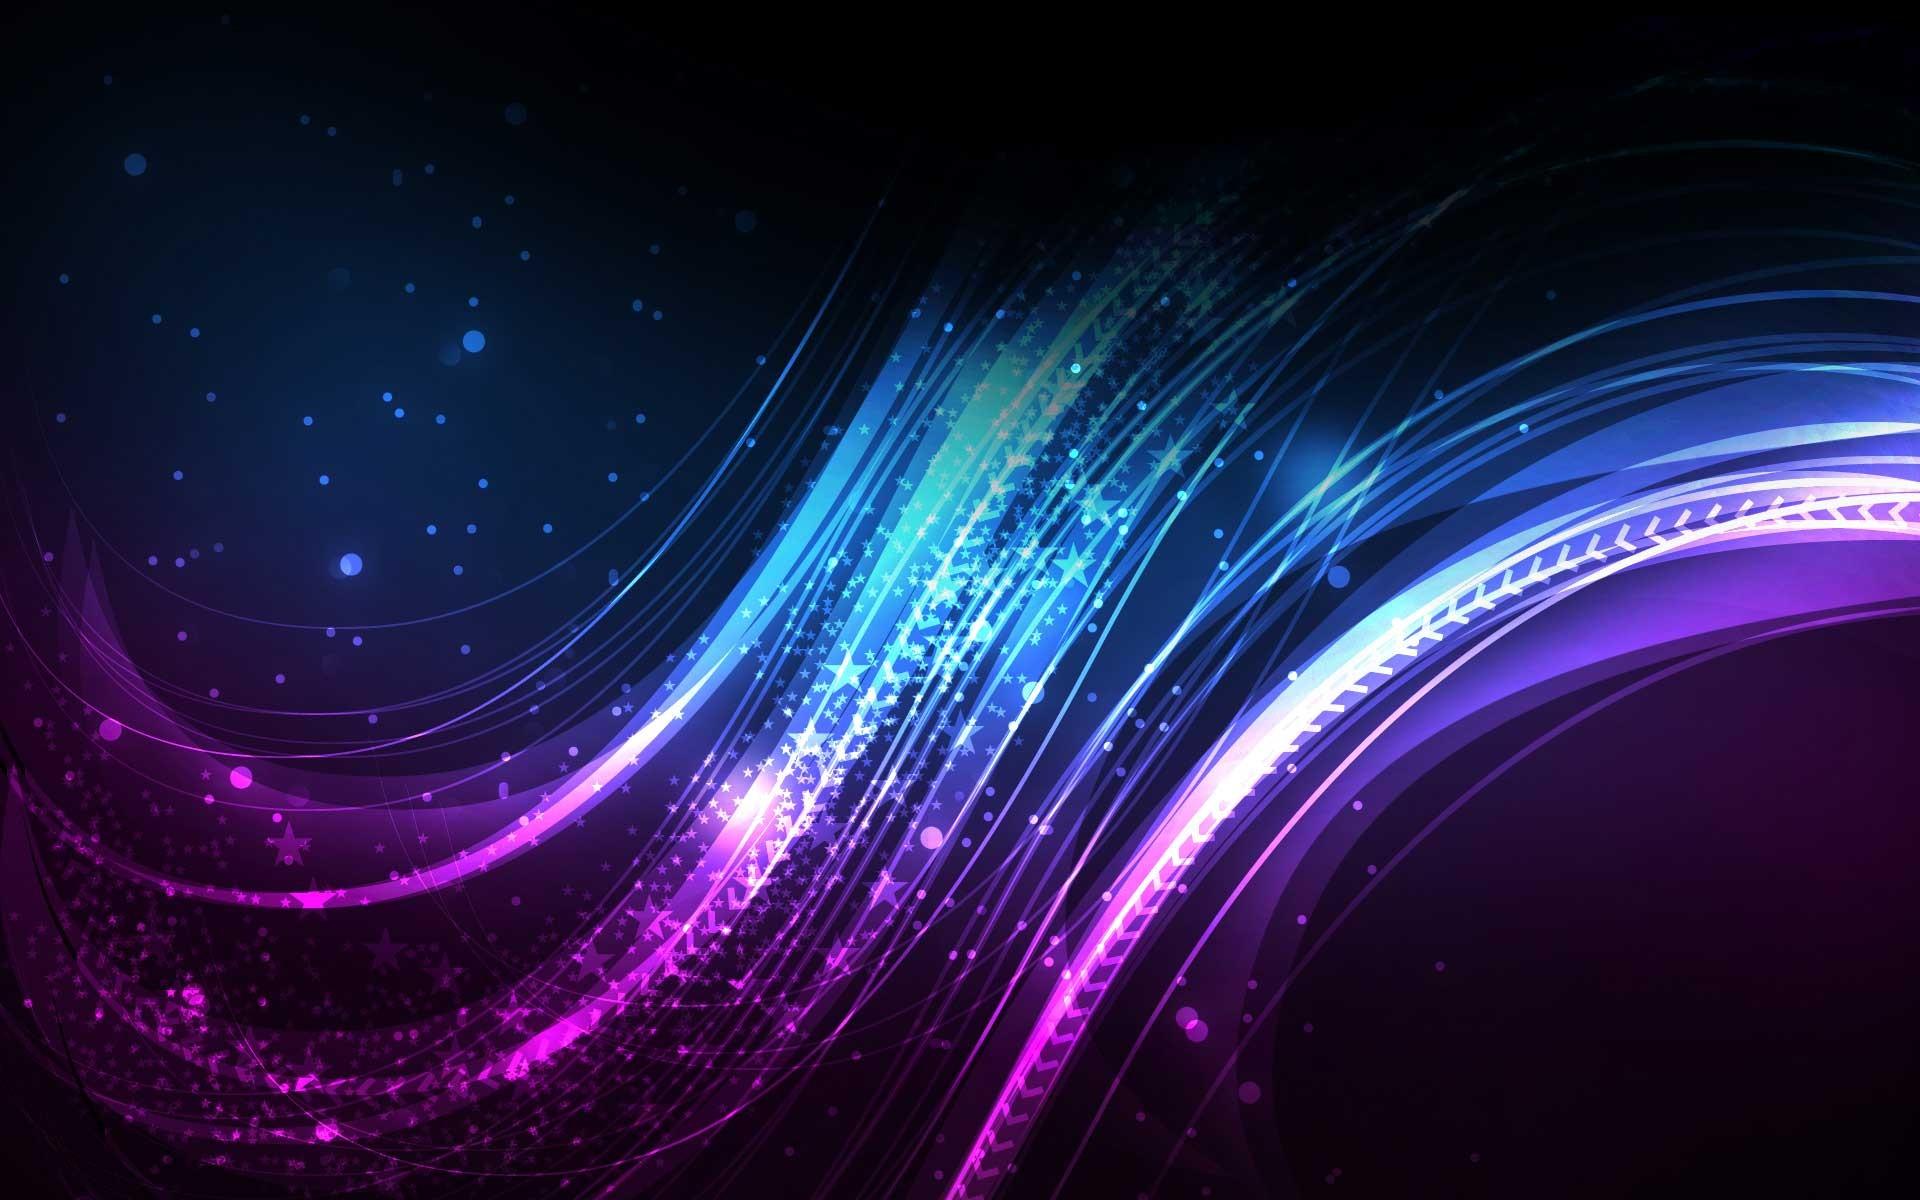 Neon wallpaper Download free cool HD wallpapers for desktop